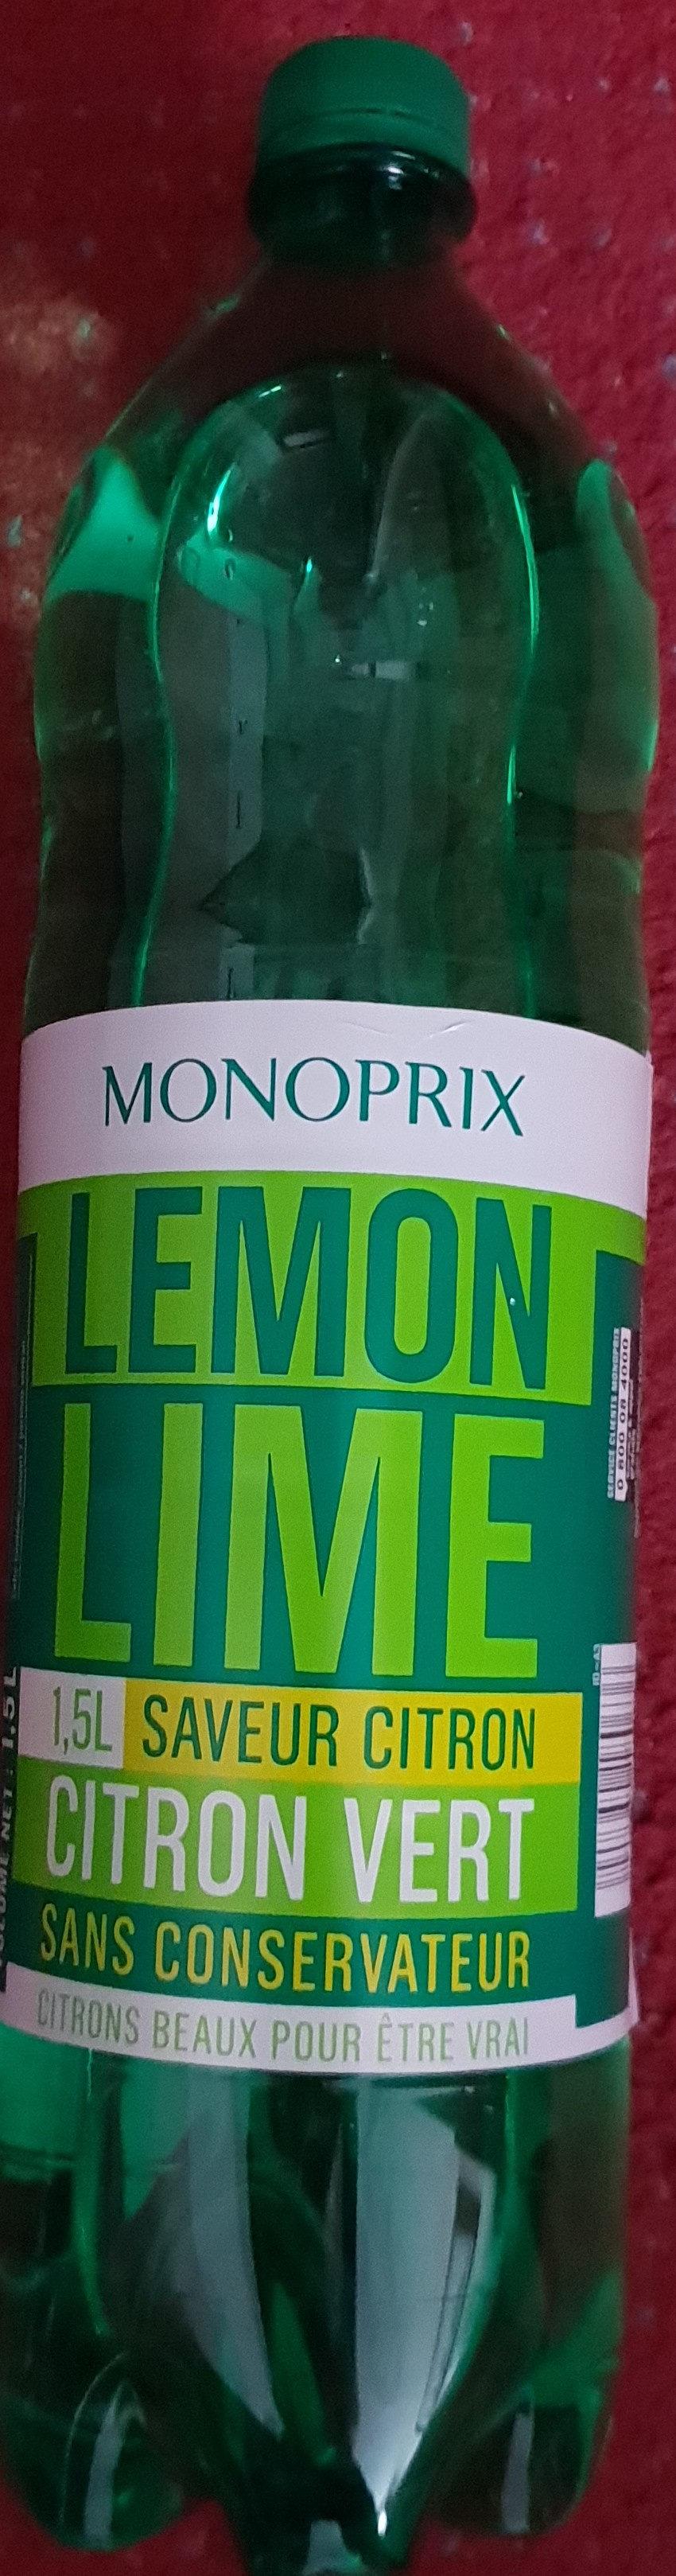 Soda Lemon Lime - Product - fr